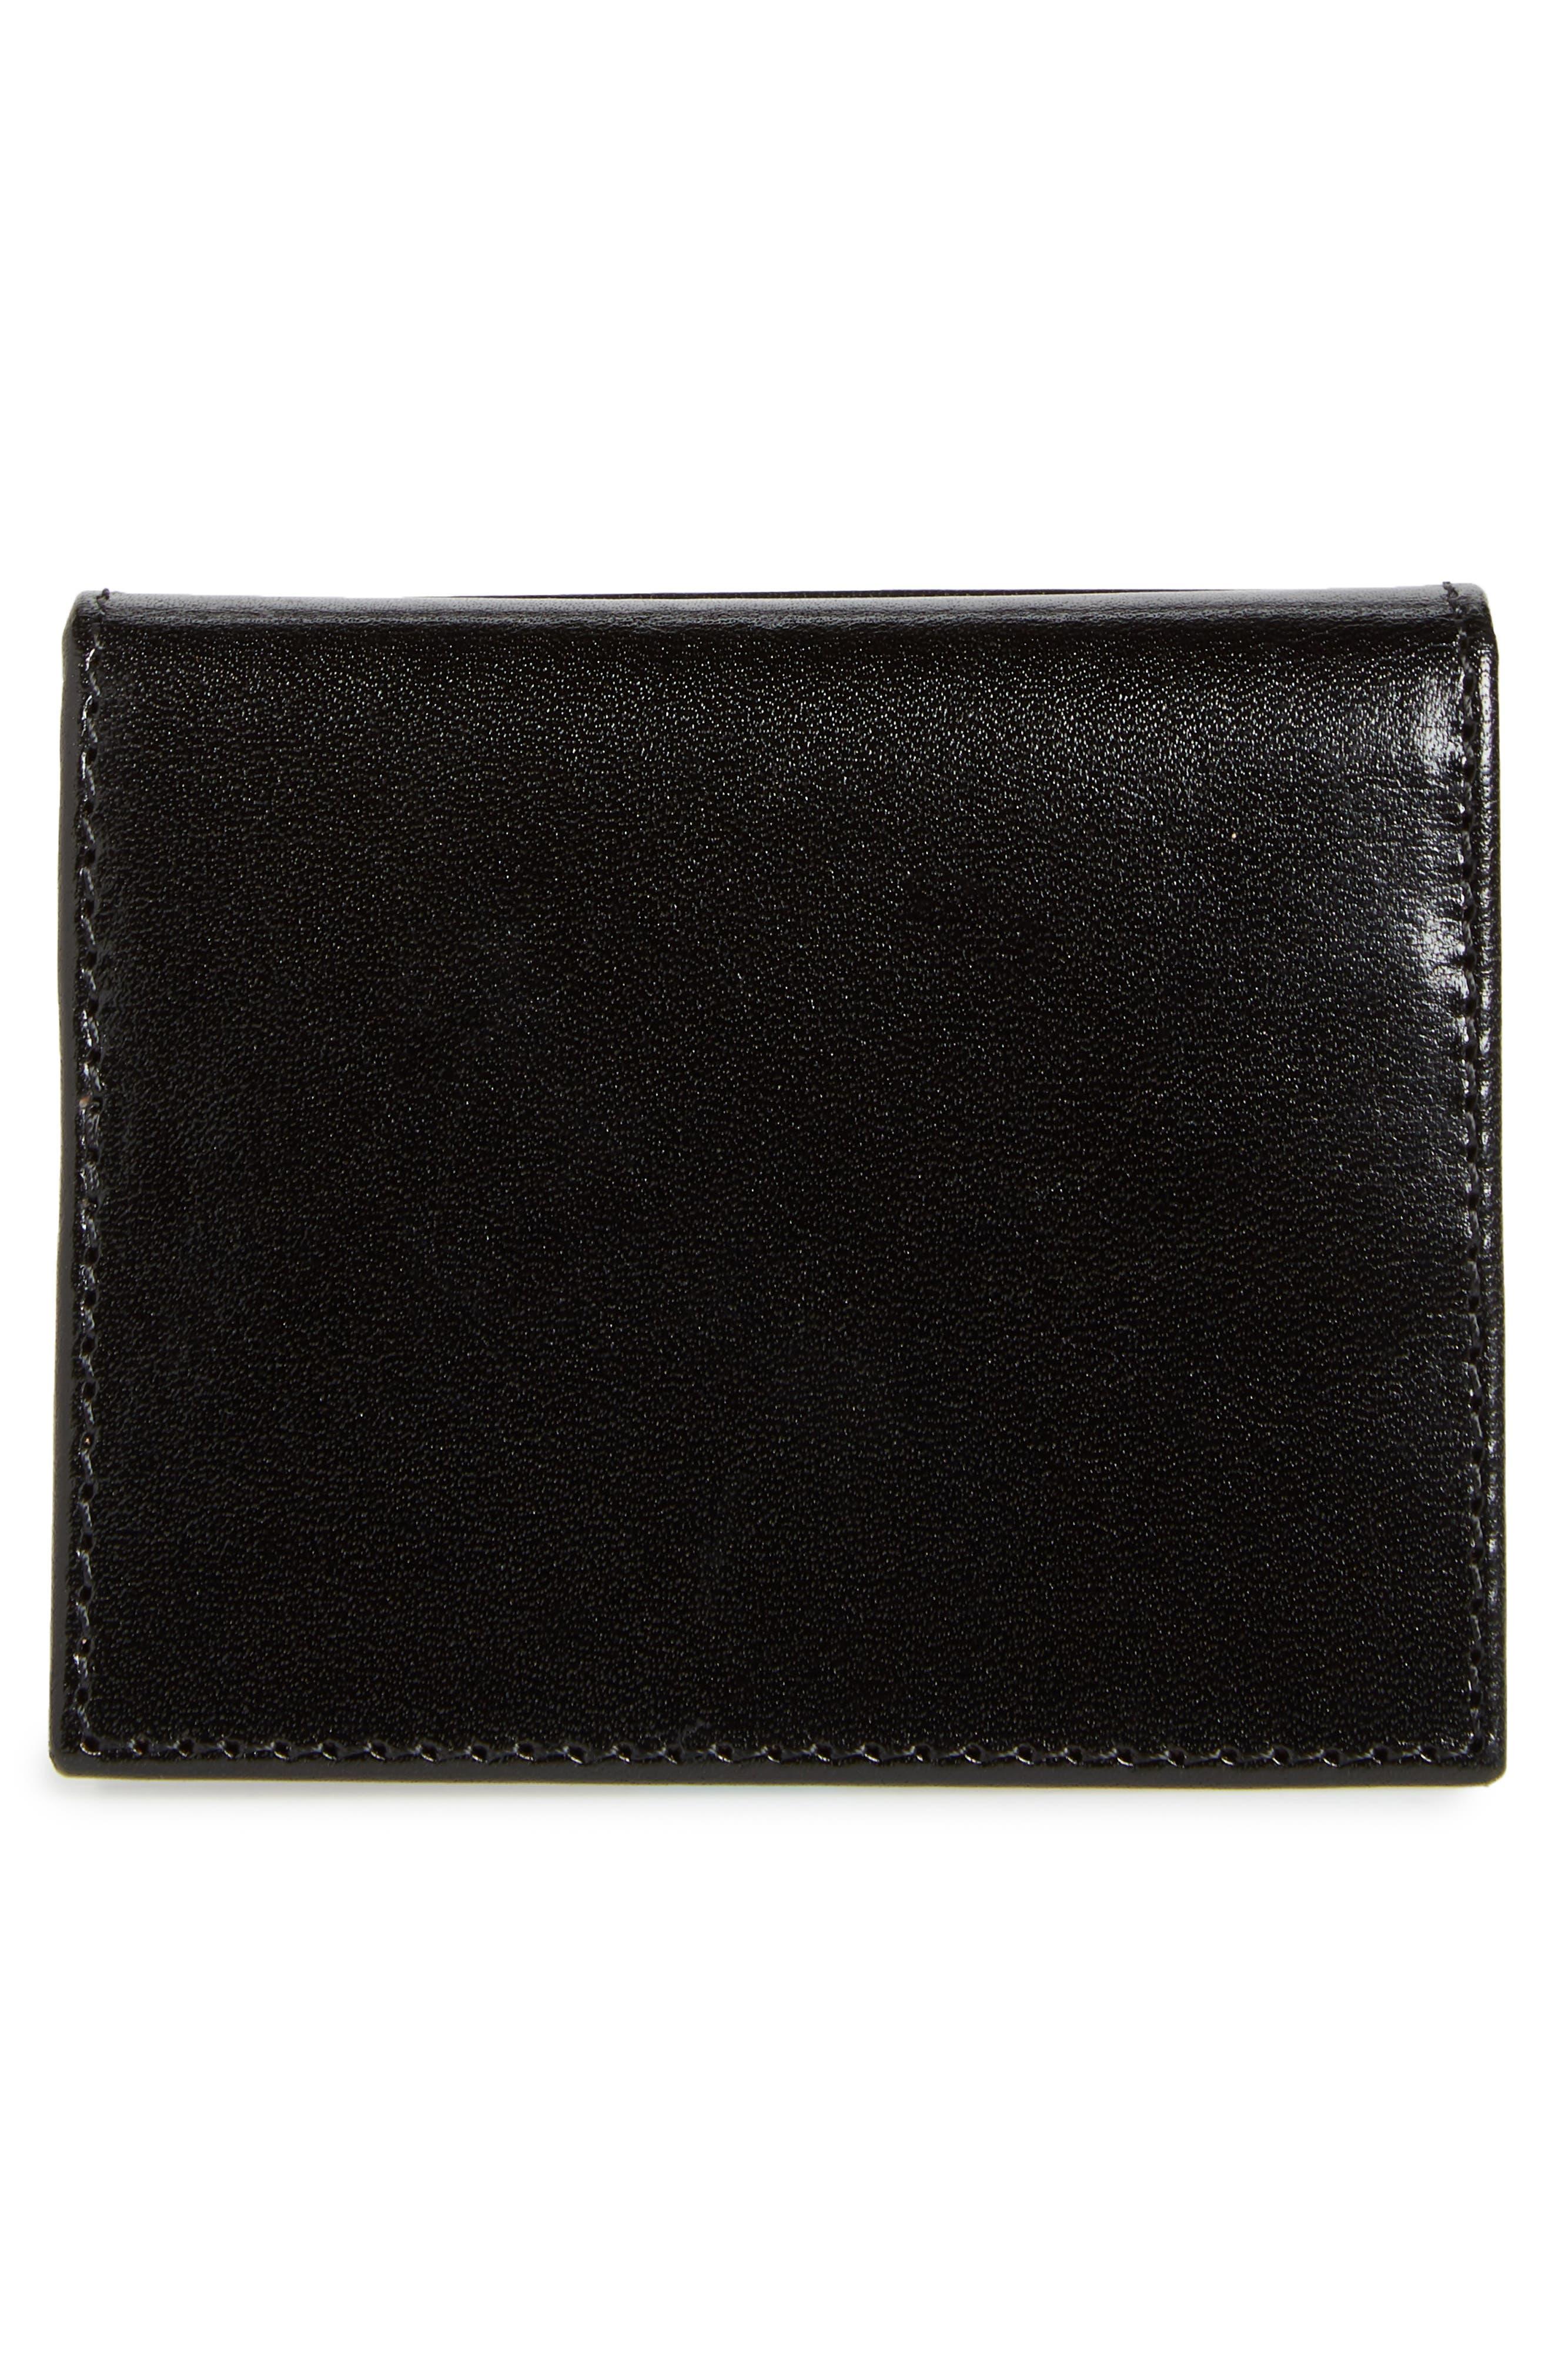 TED BAKER LONDON,                             Contrast Internals Leather Card Case,                             Alternate thumbnail 3, color,                             BLACK